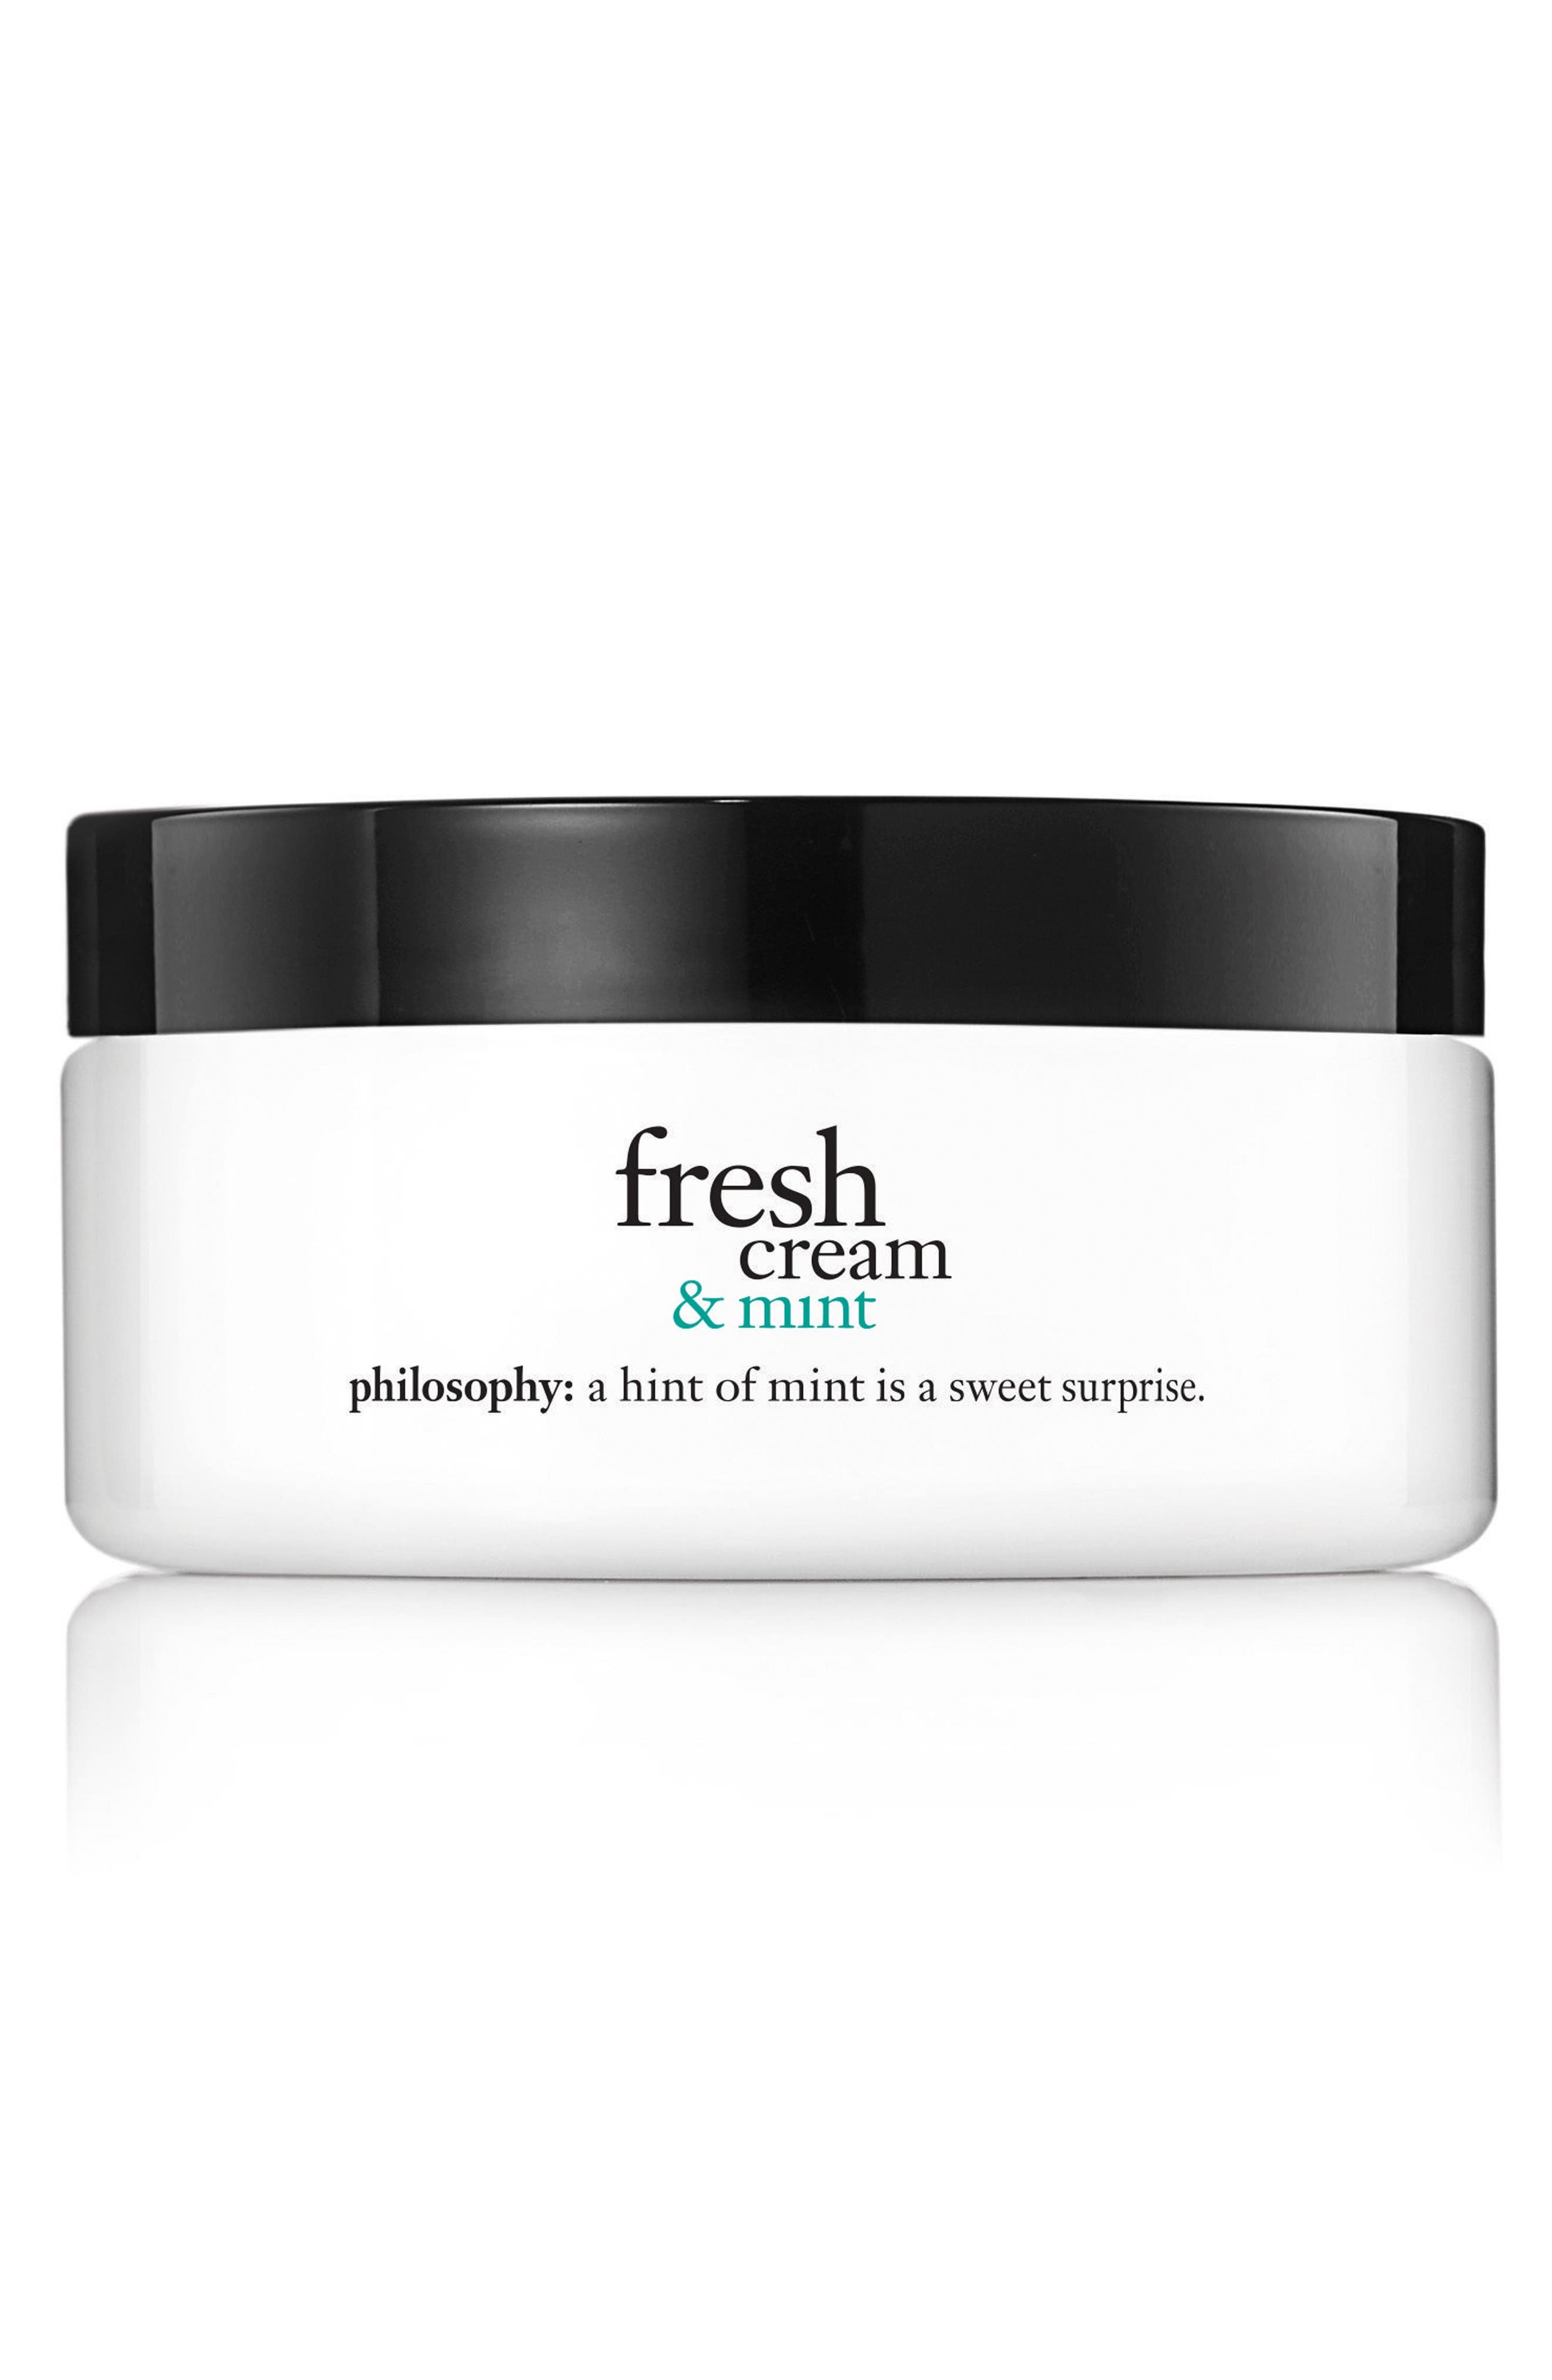 philosophy fresh cream & mint soufflé